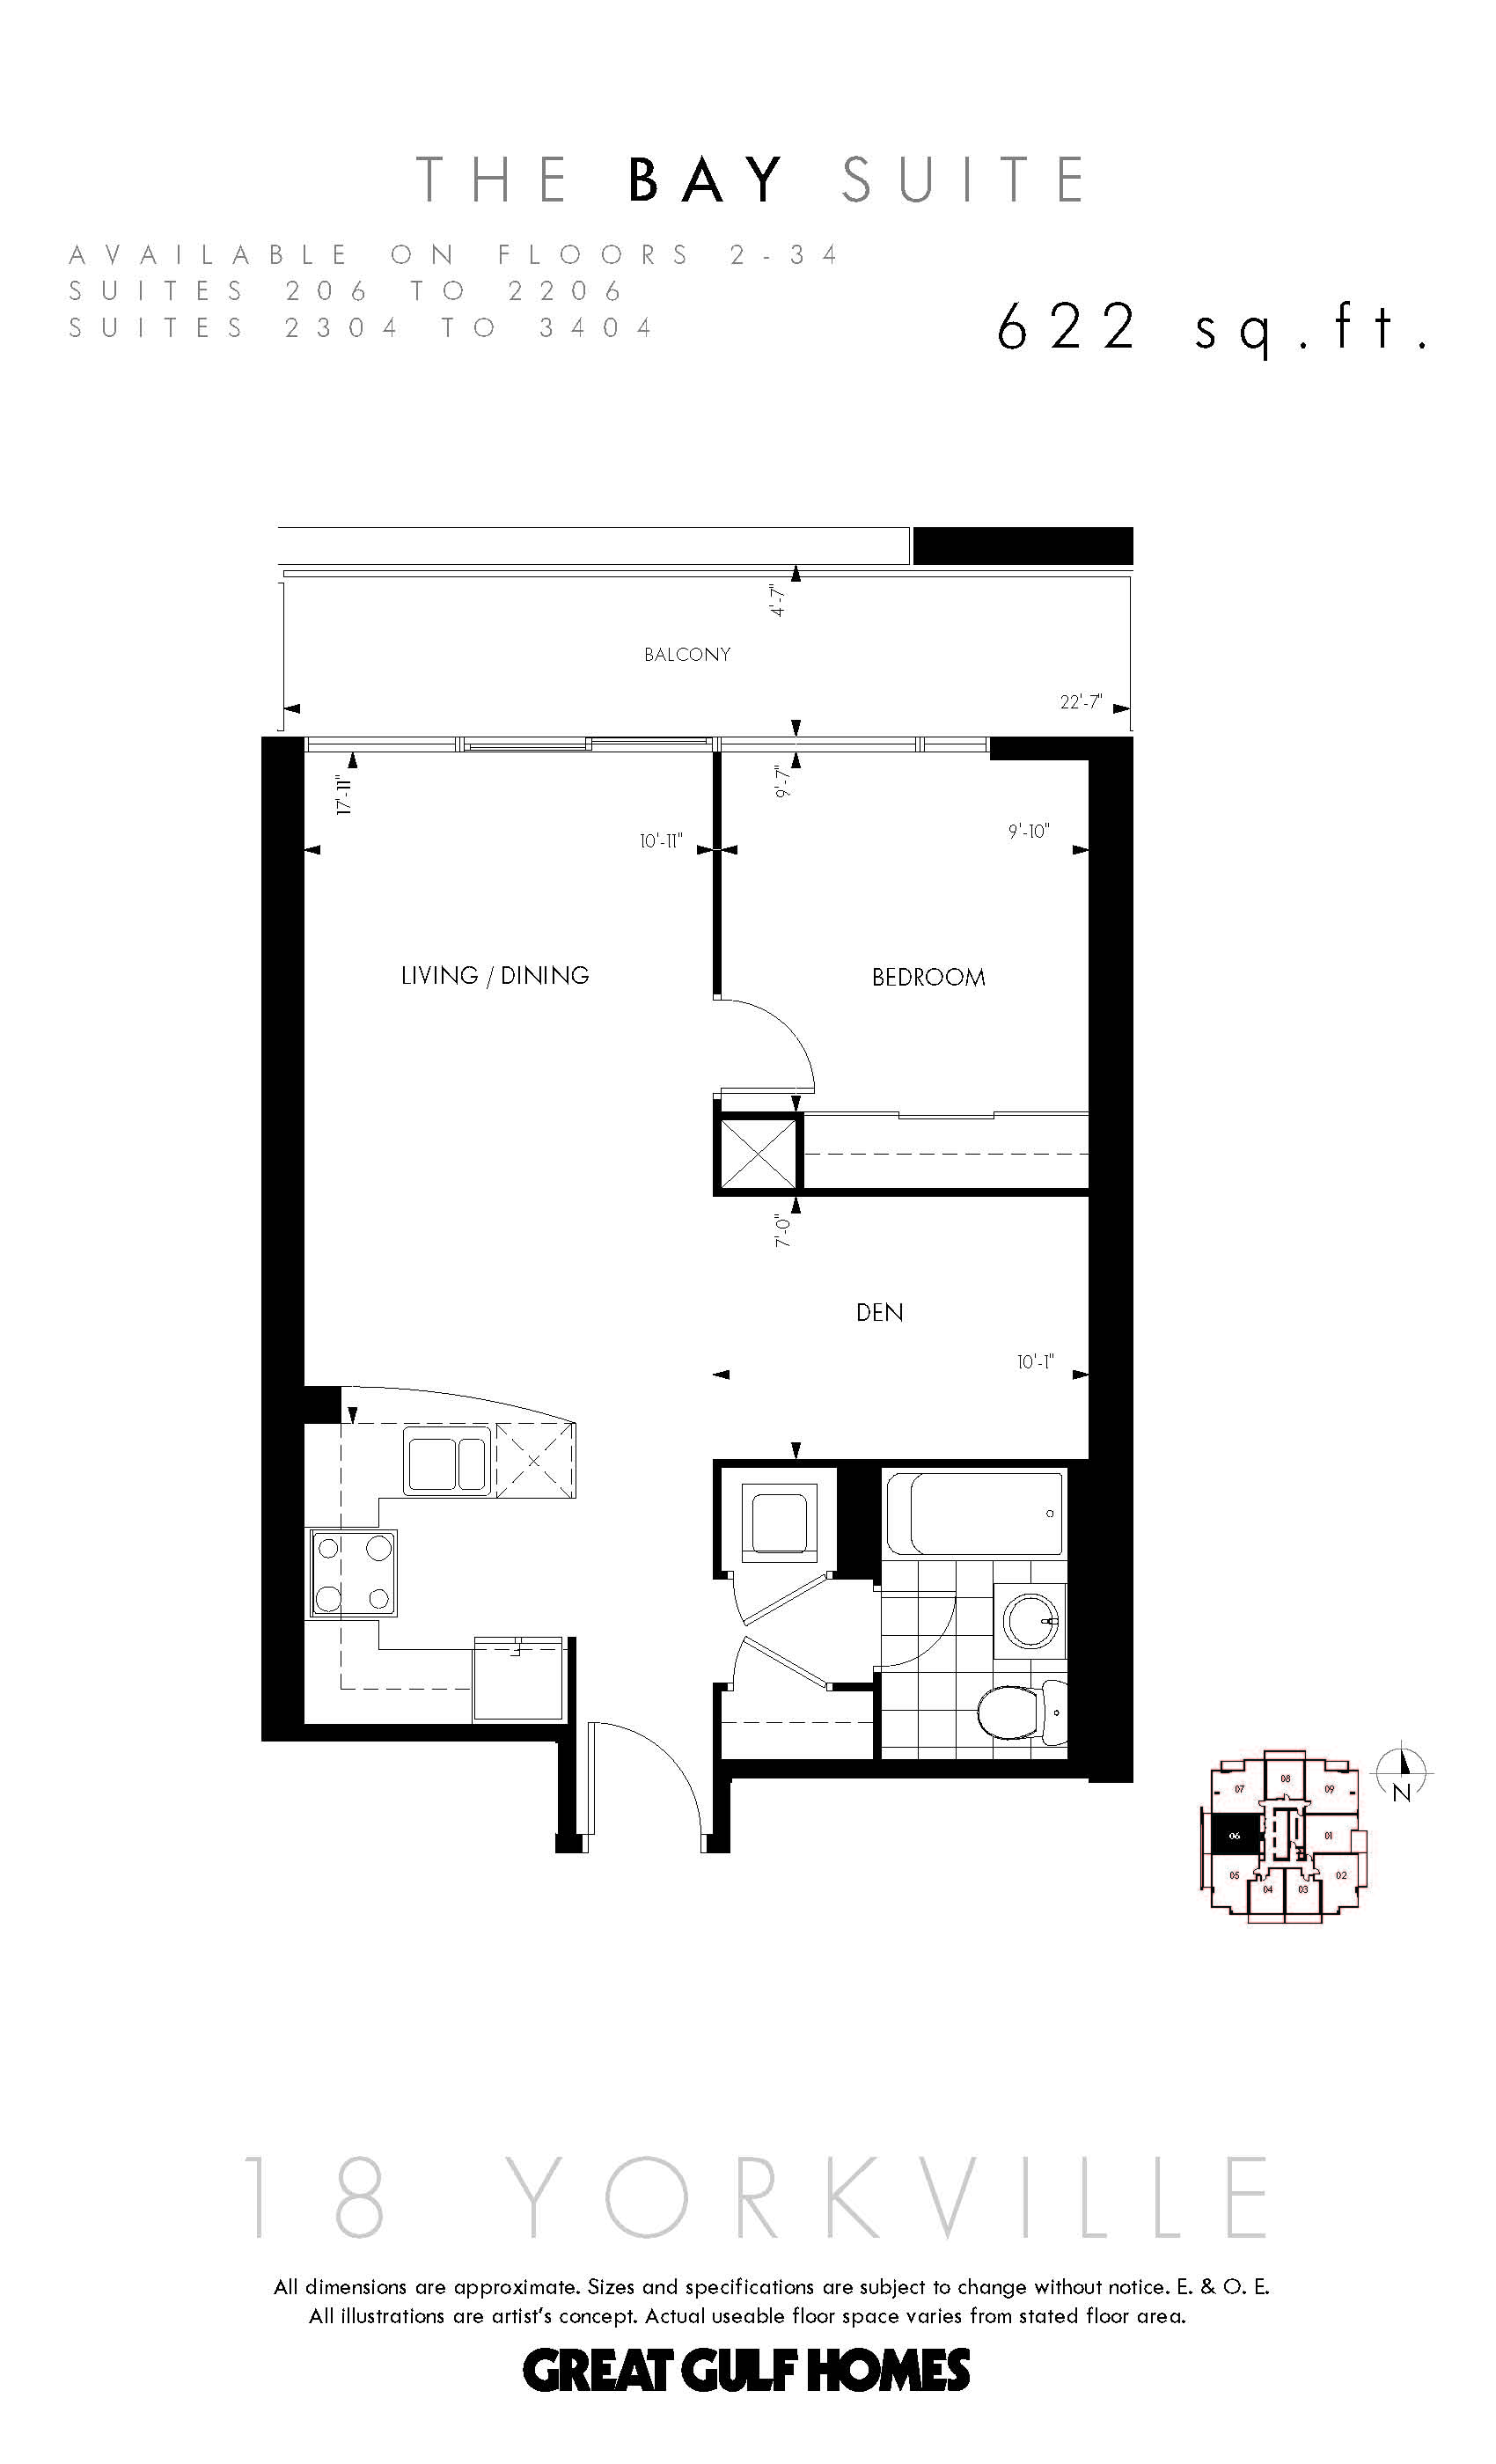 floor plans for 18 yorkville condos 18 yorkville condos